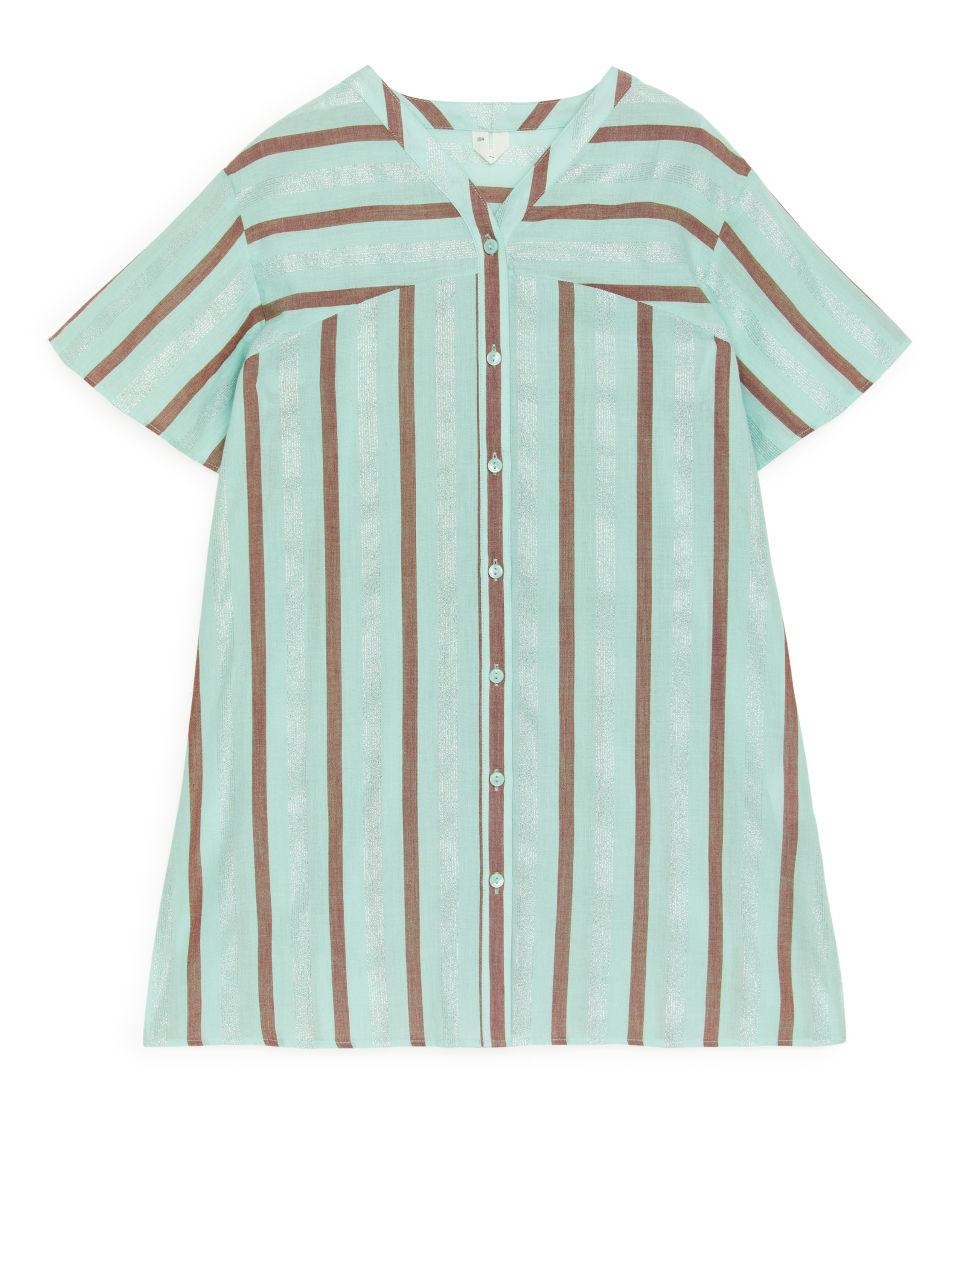 Kaftan Dress - Turquoise